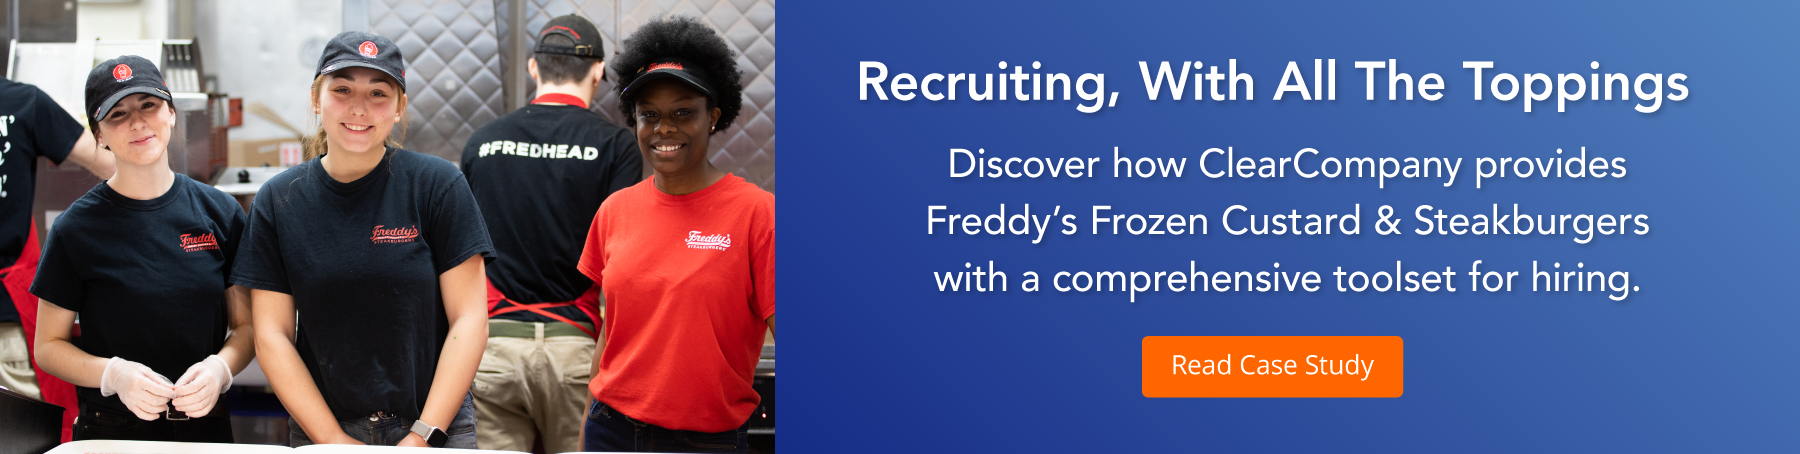 freddys-steakburger-hiring-tools-cta